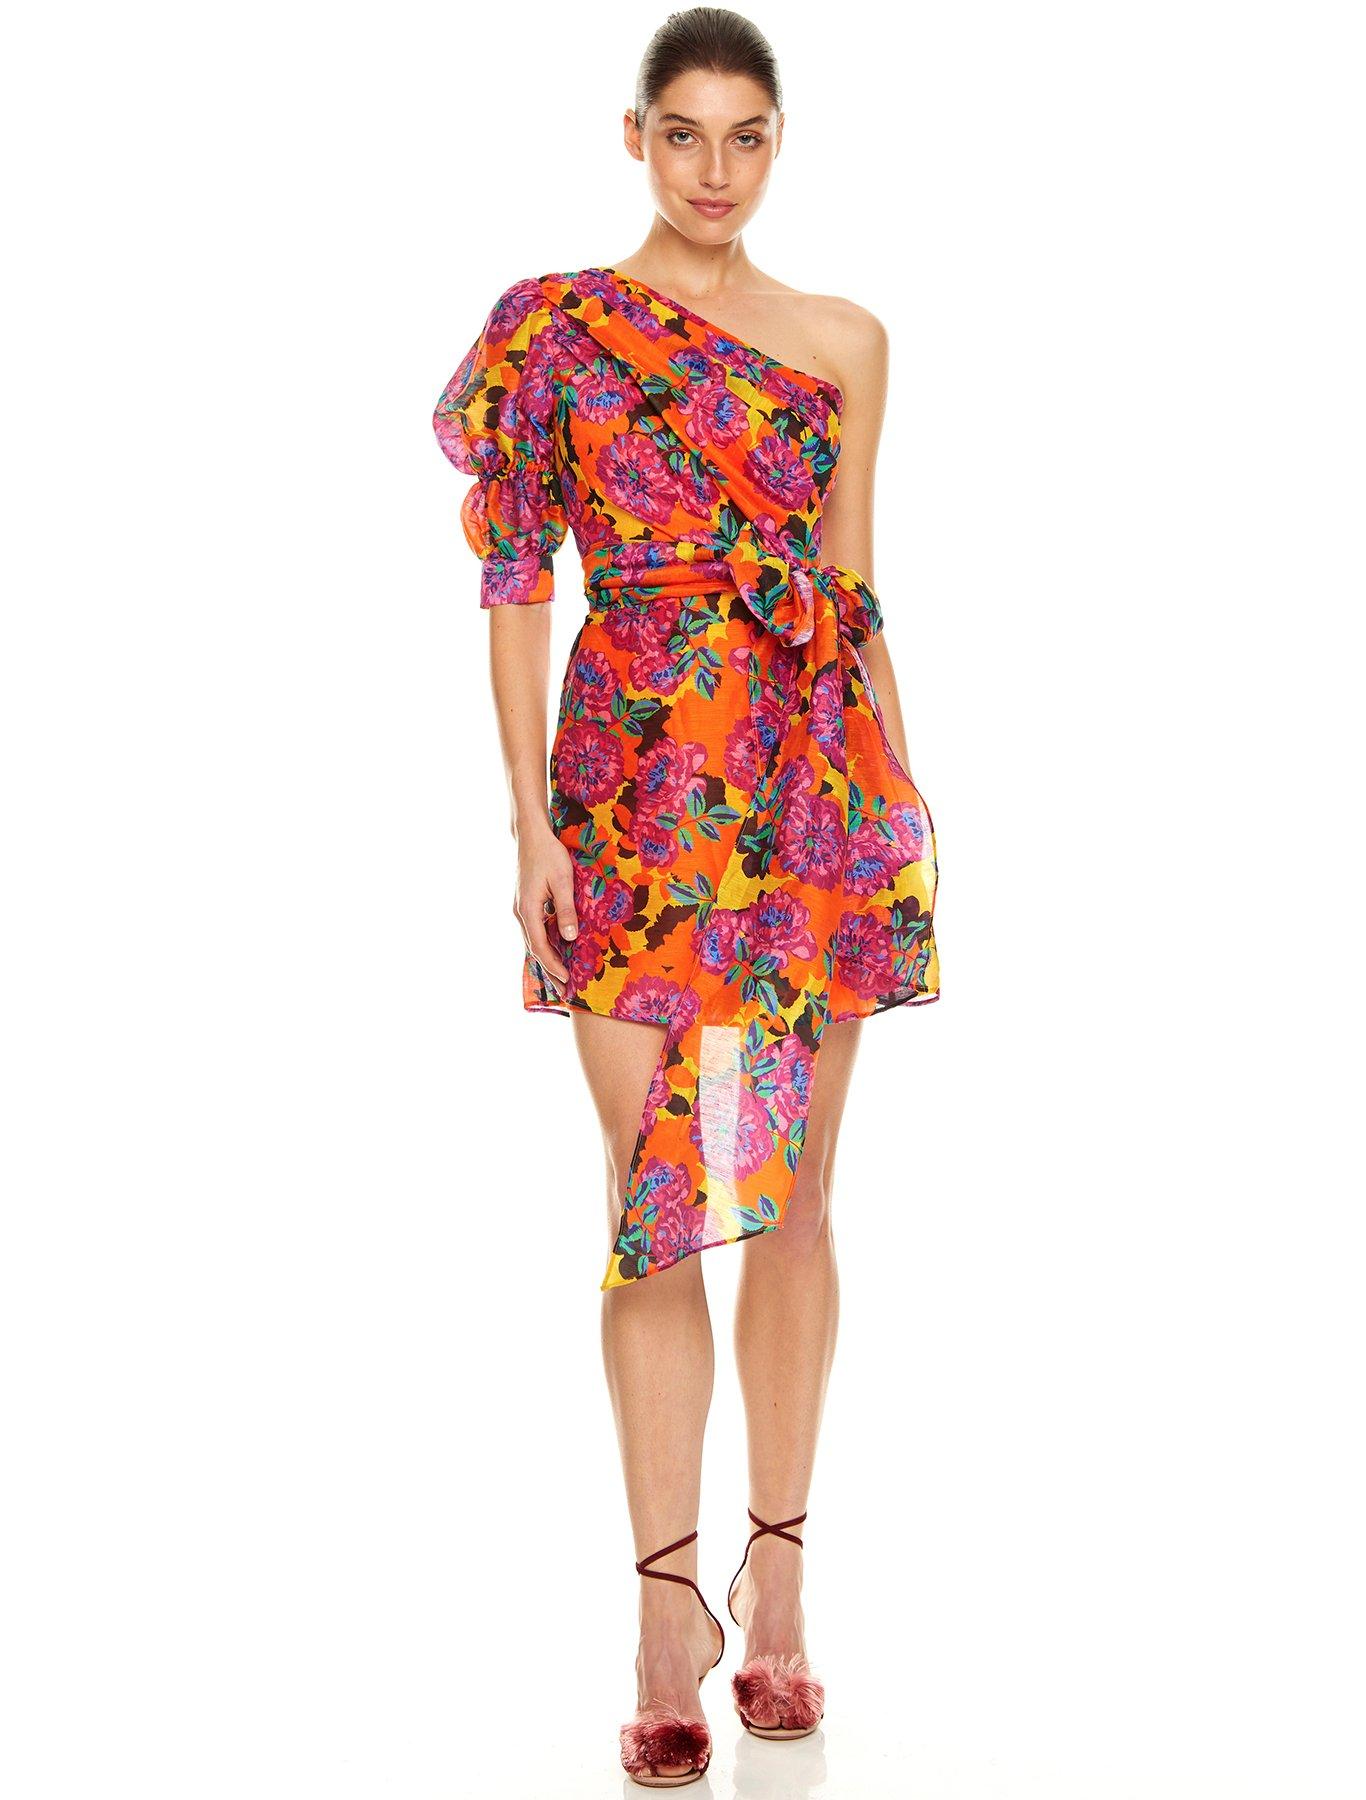 Blossom mini dress in 2020 evening dresses australia